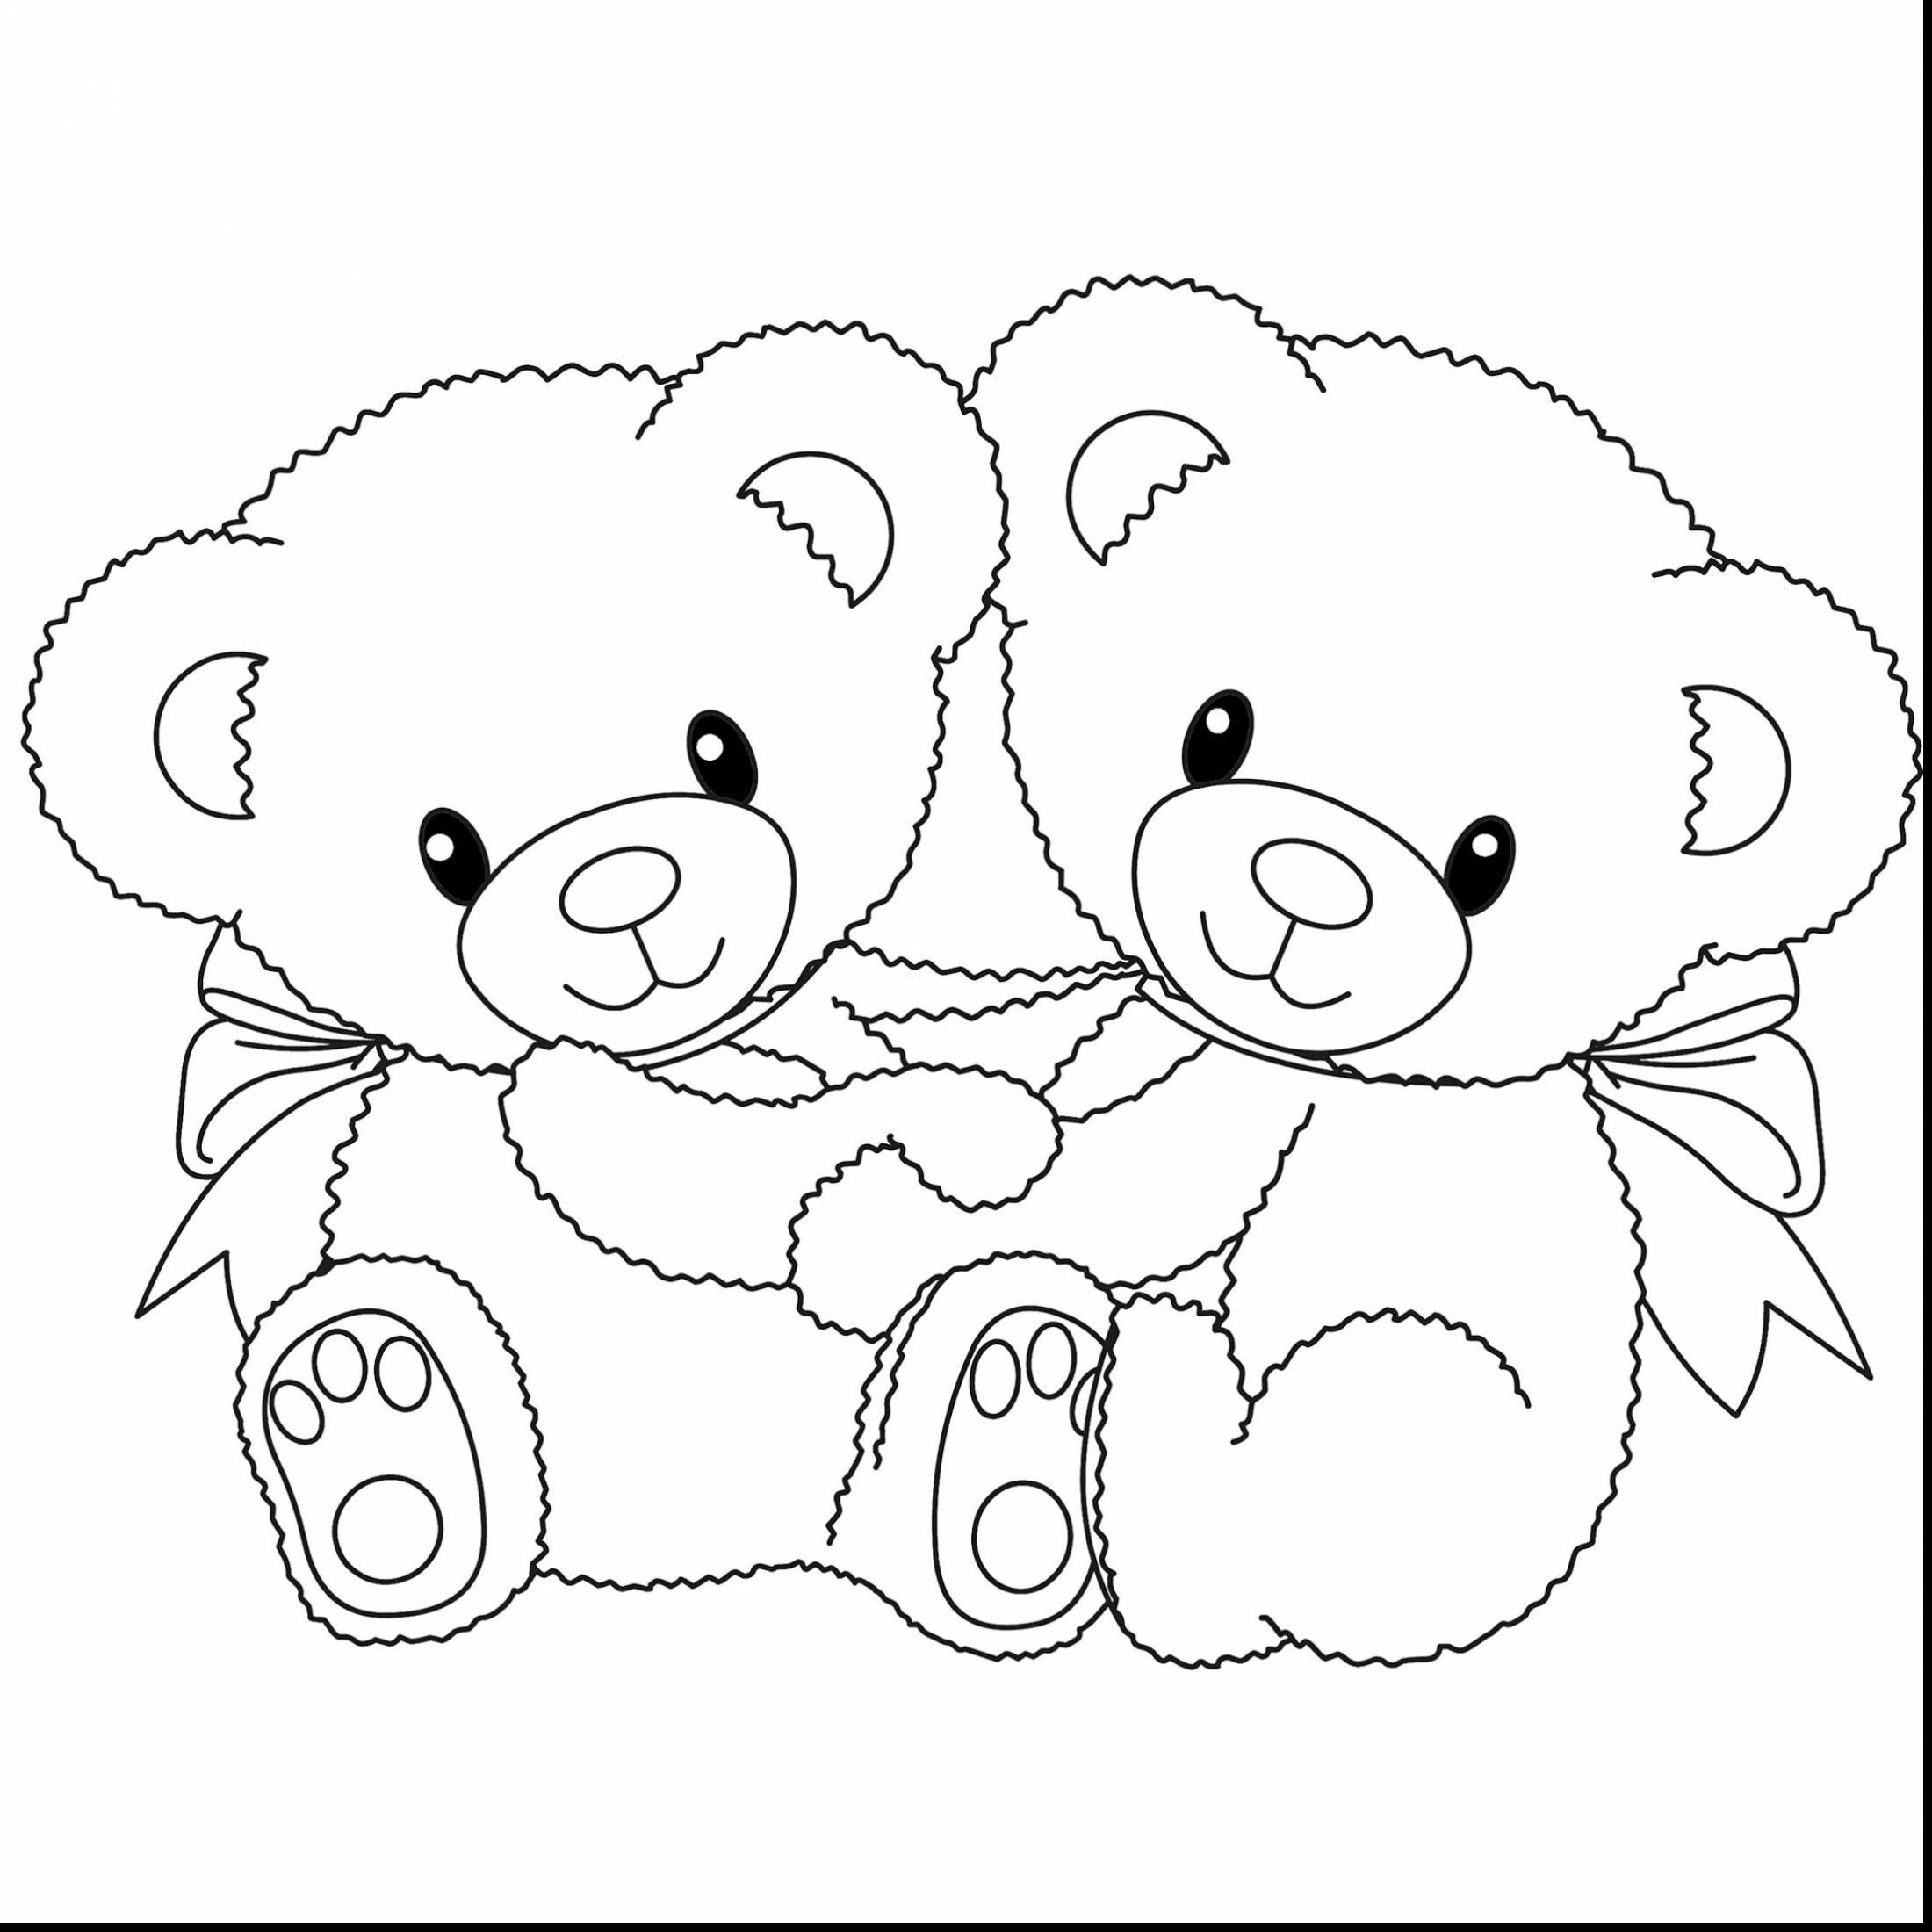 Panda Bear Coloring Pages  Panda Bear Coloring Pages coloringsuite